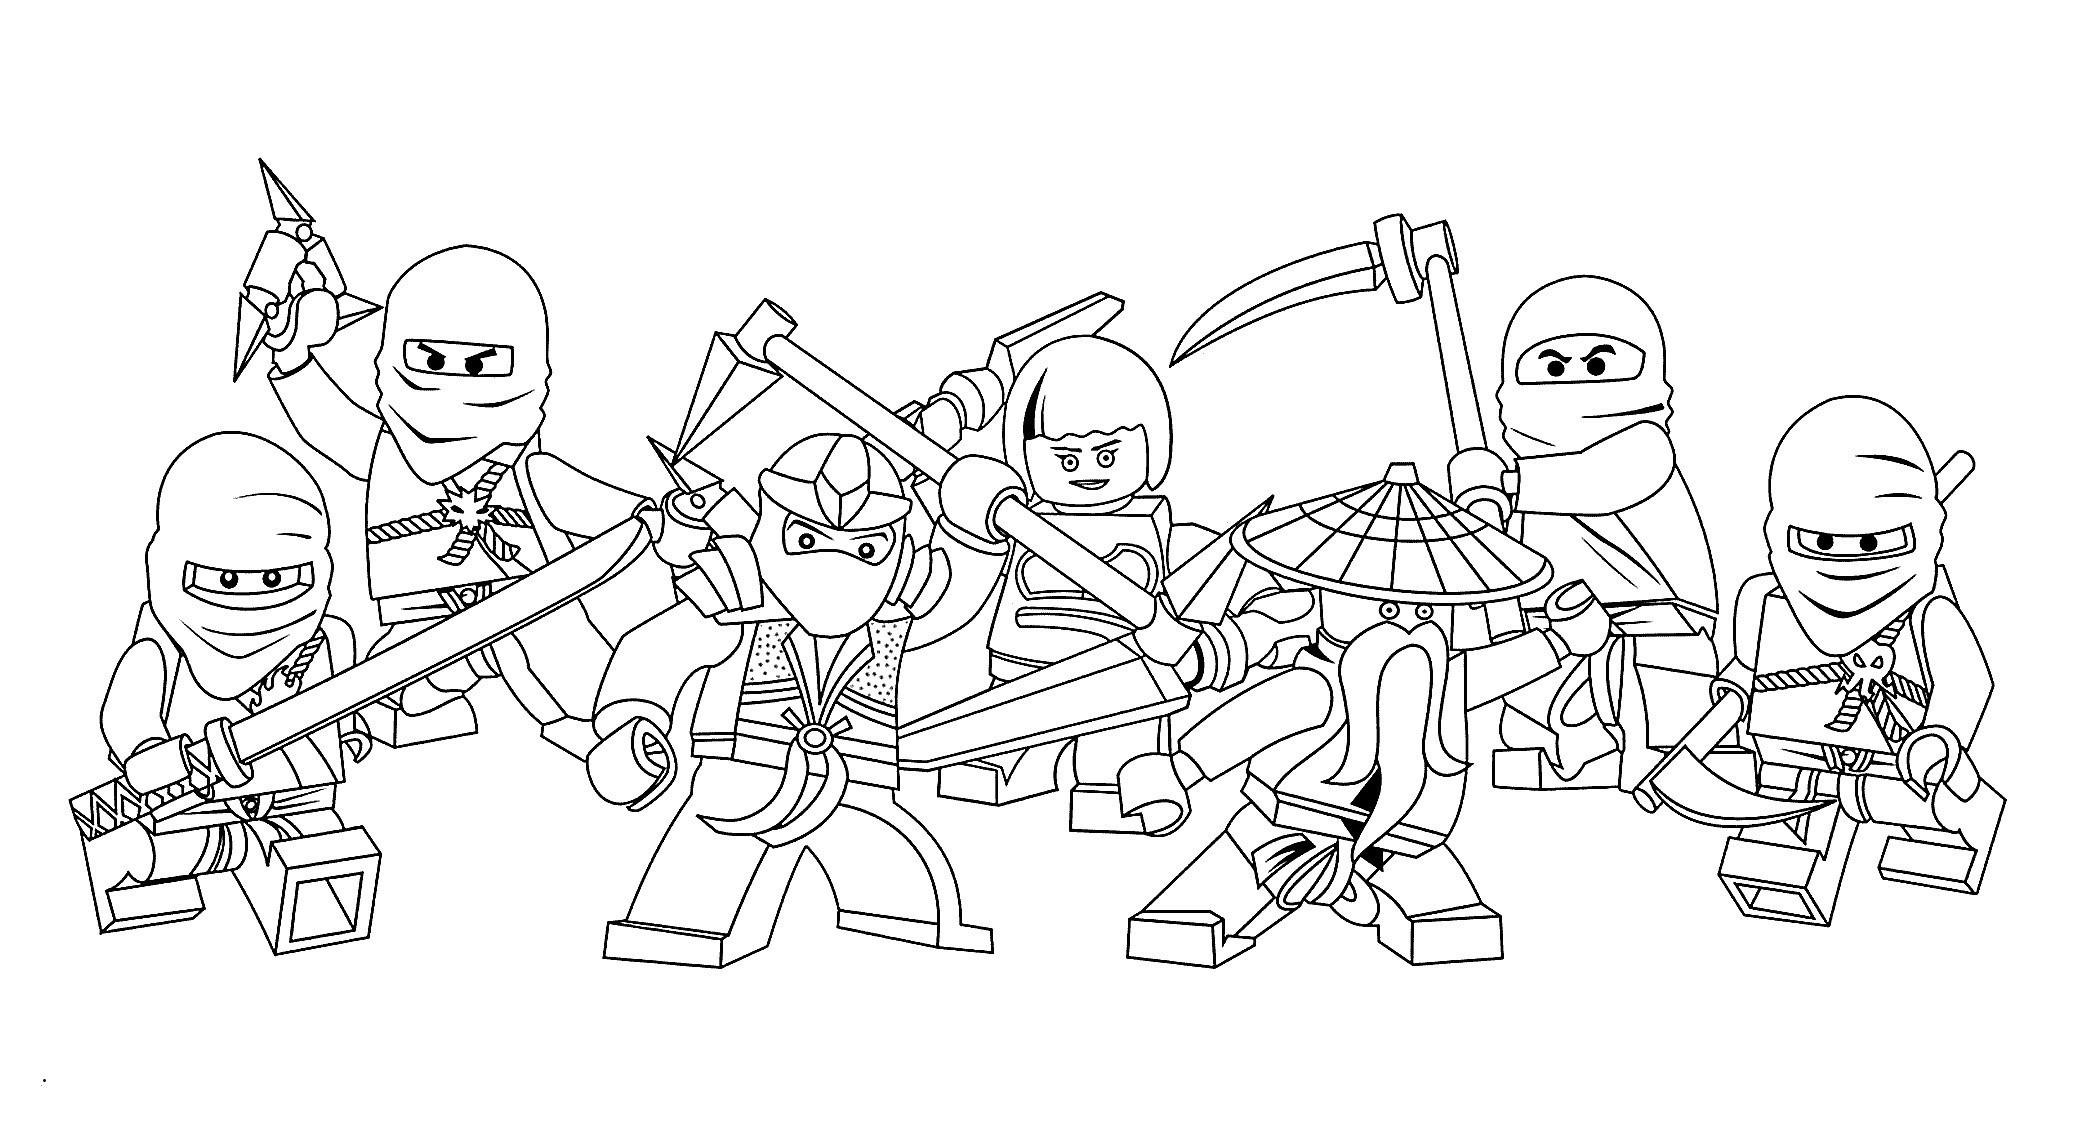 Ninjago Ausmalbilder Lord Garmadon Neu Ninjago Ausmalbilder Lloyd 2015 Inspirierend Free Printable Lego Das Bild